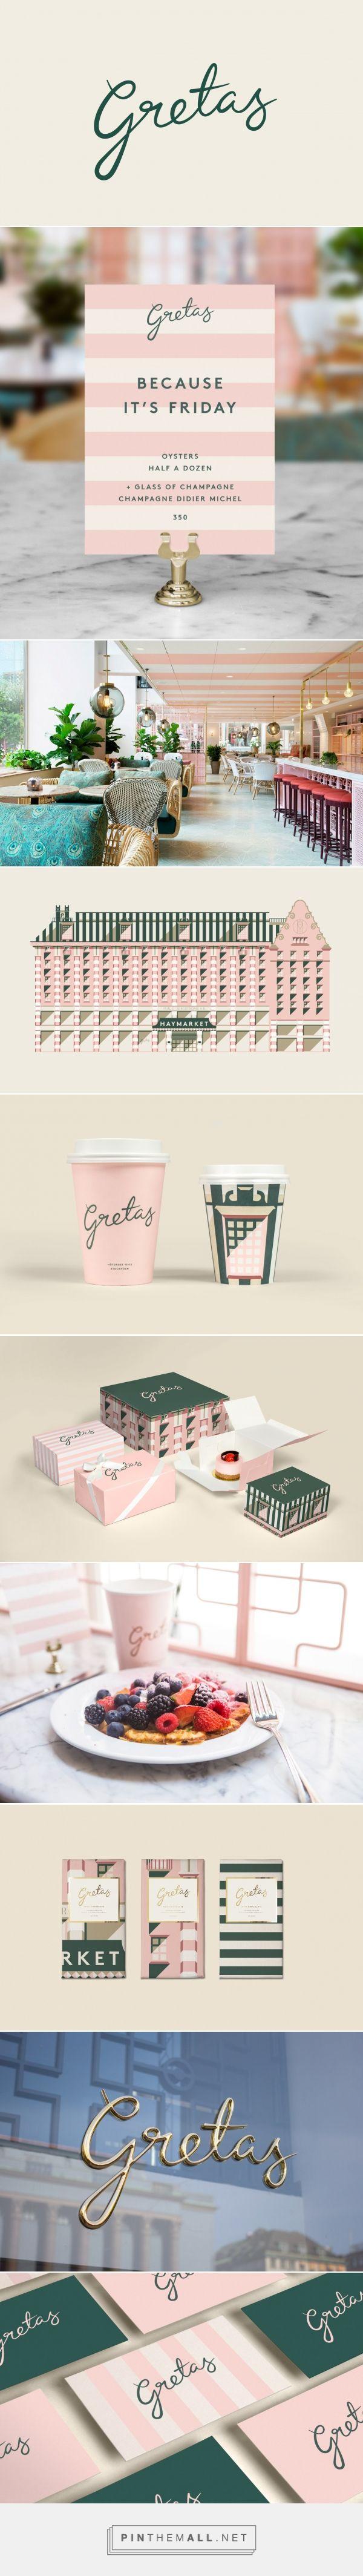 Gretas Cafe Branding by 25AH | Fivestar Branding Agency – Design and Branding Agency & Curated Inspiration Gallery